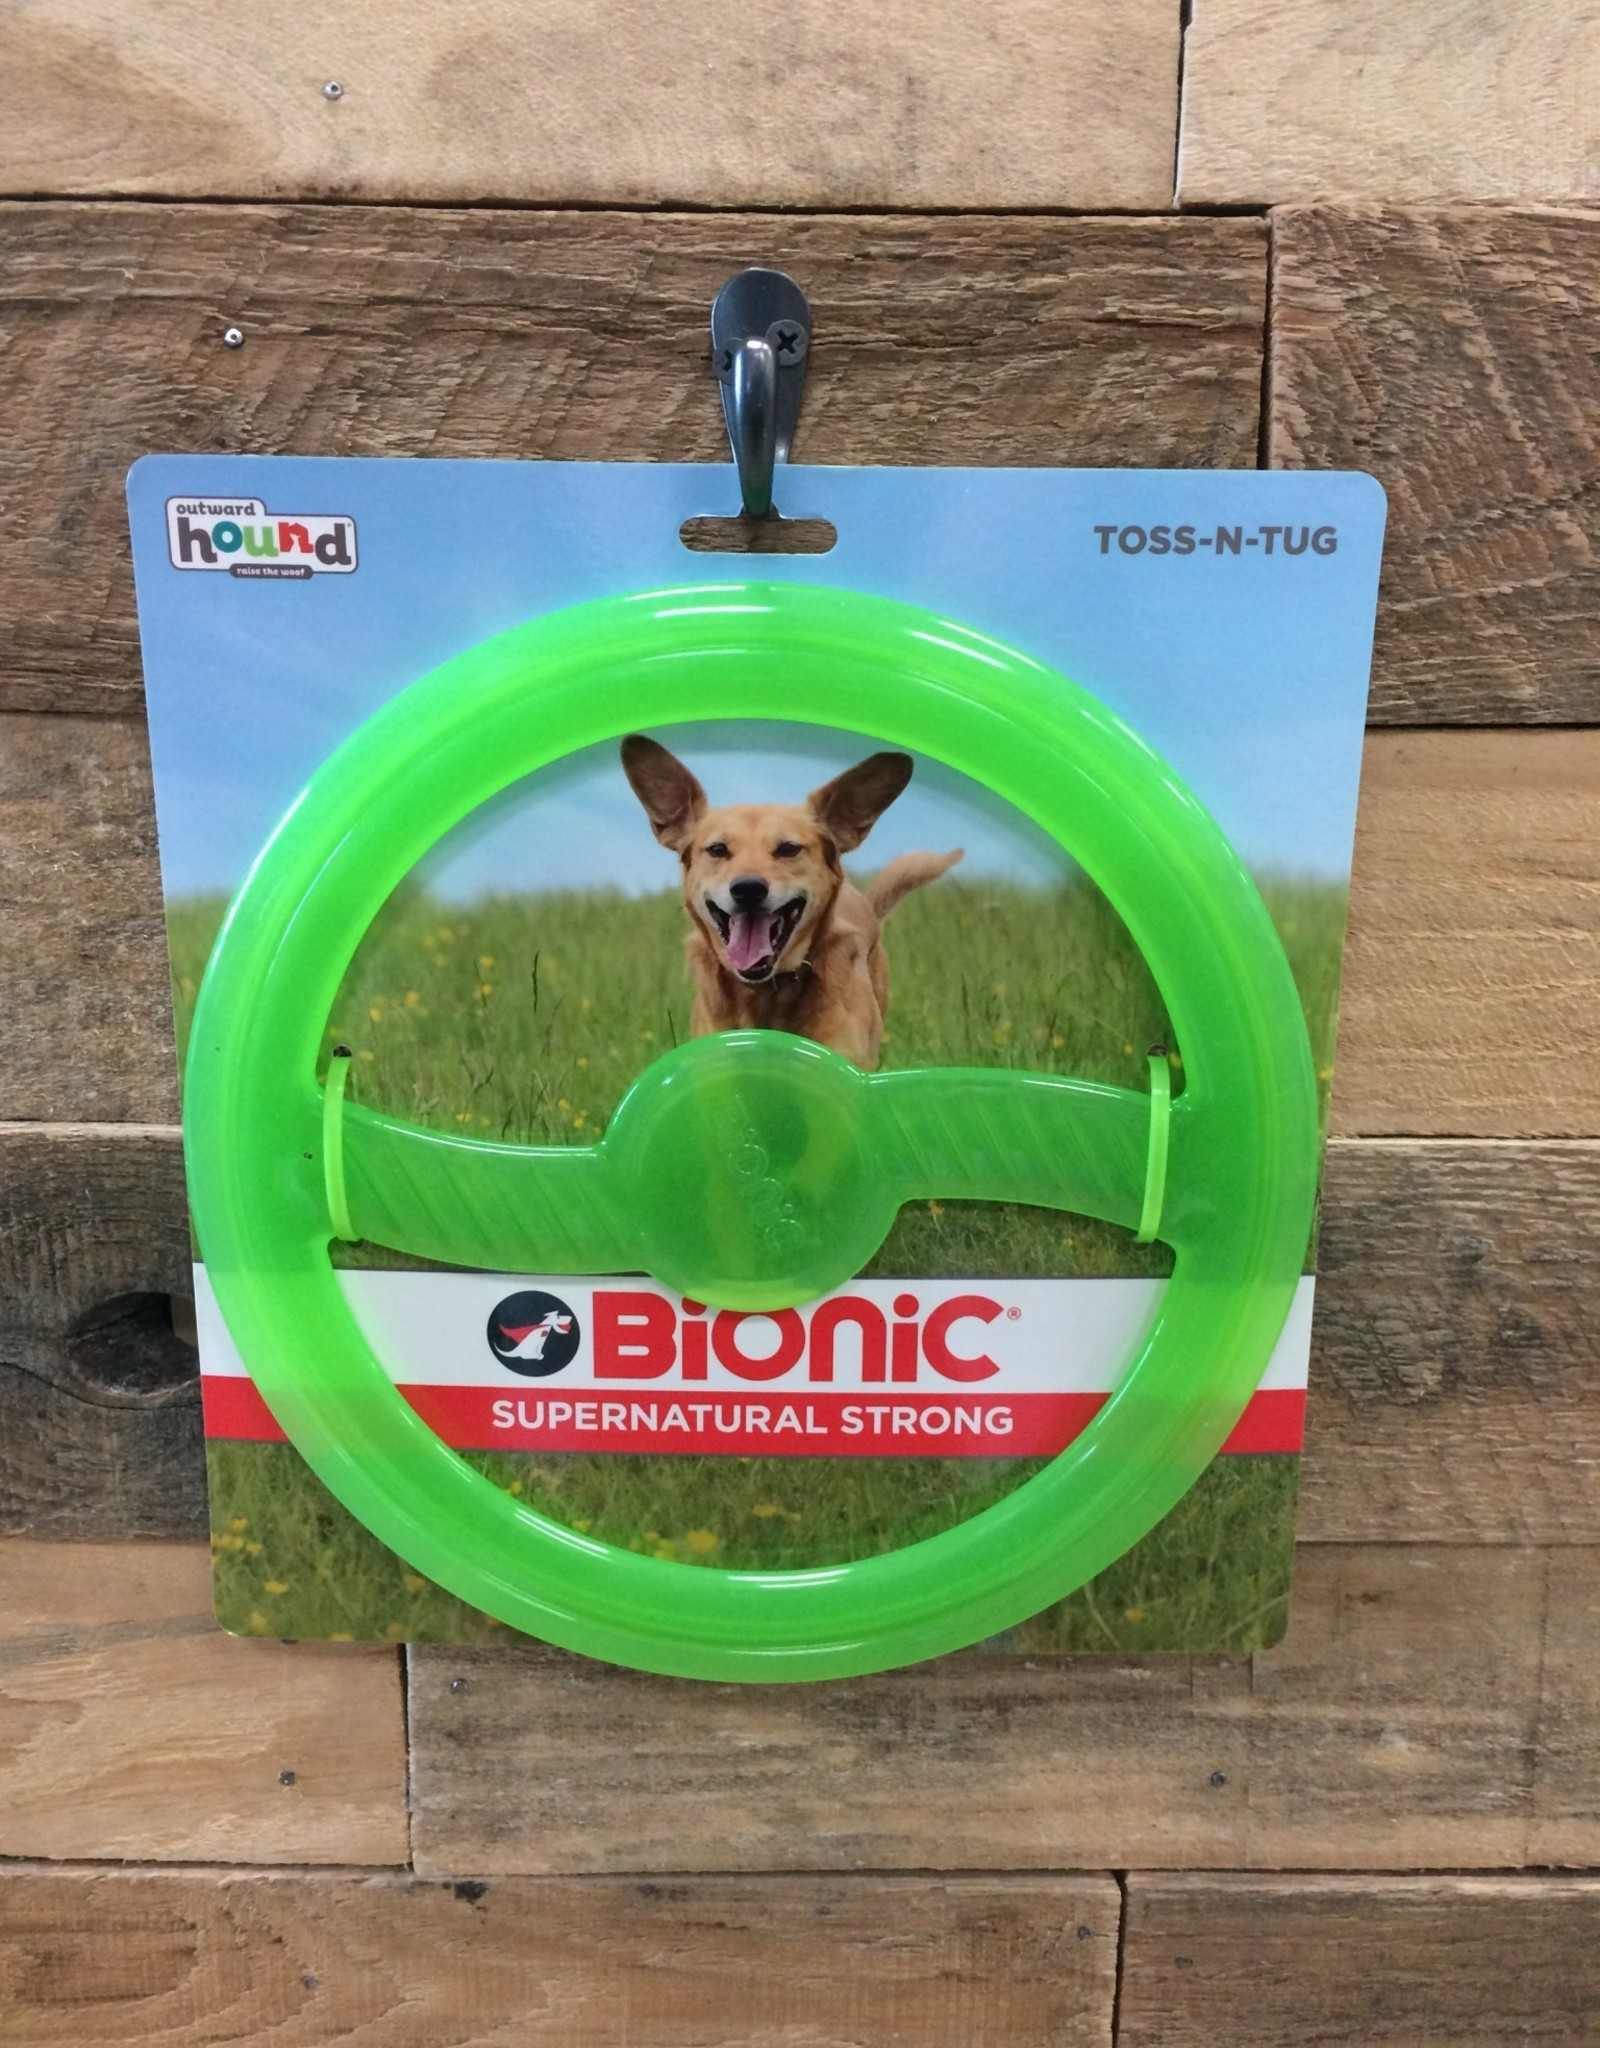 Outward Hound - Bionic Bionic Toss and tug green